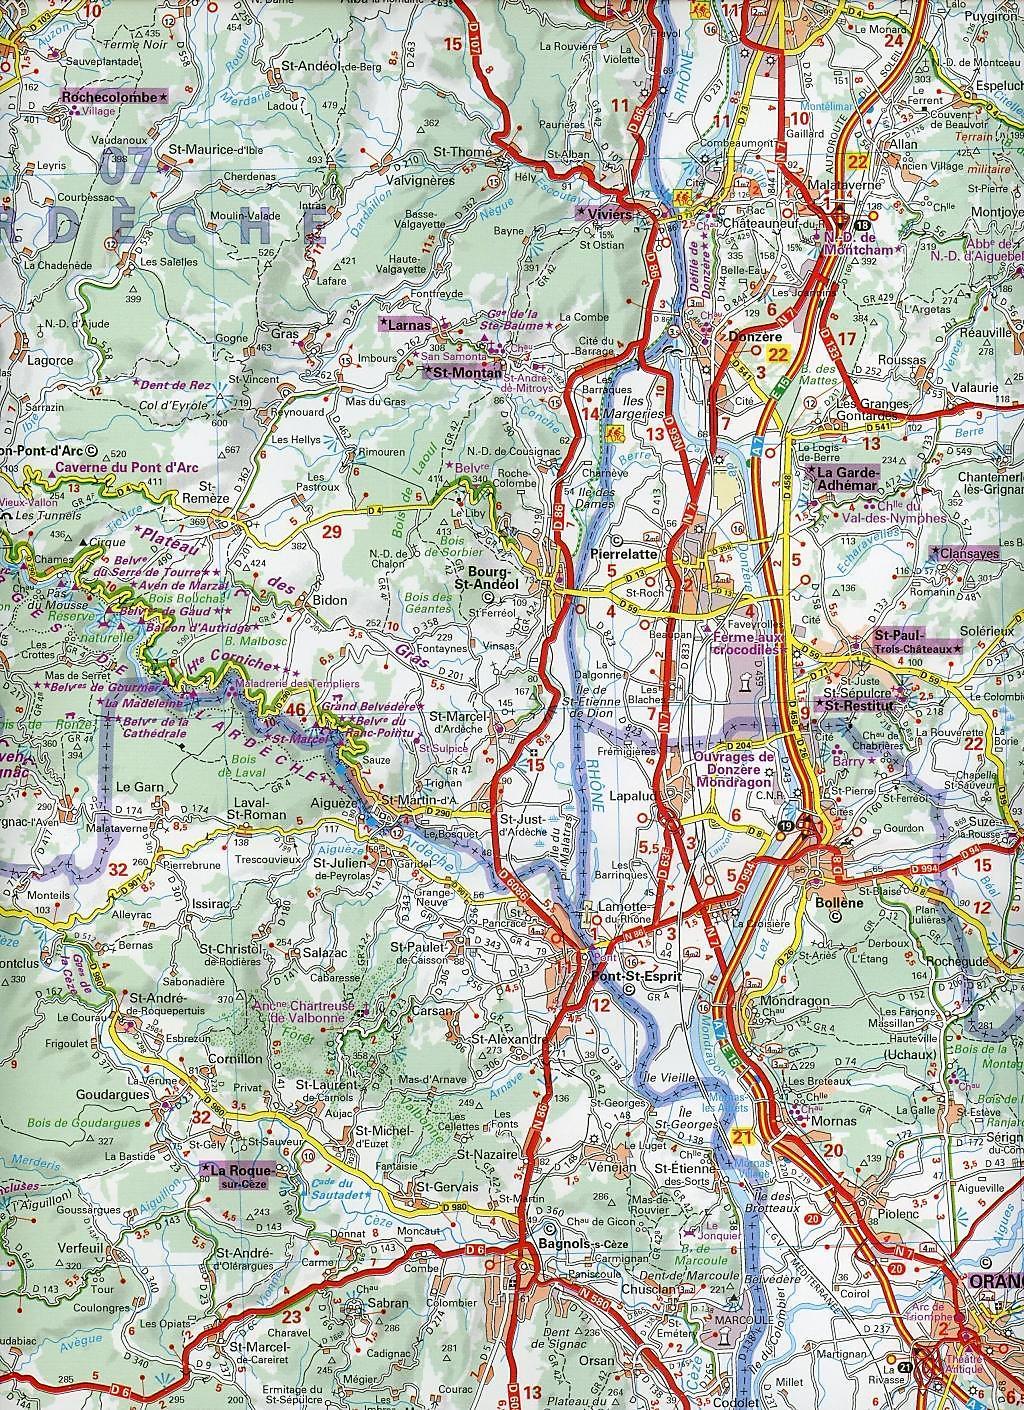 Camargue Karte.Michelin Karte Provence Camargue Buch Bei Weltbild De Bestellen